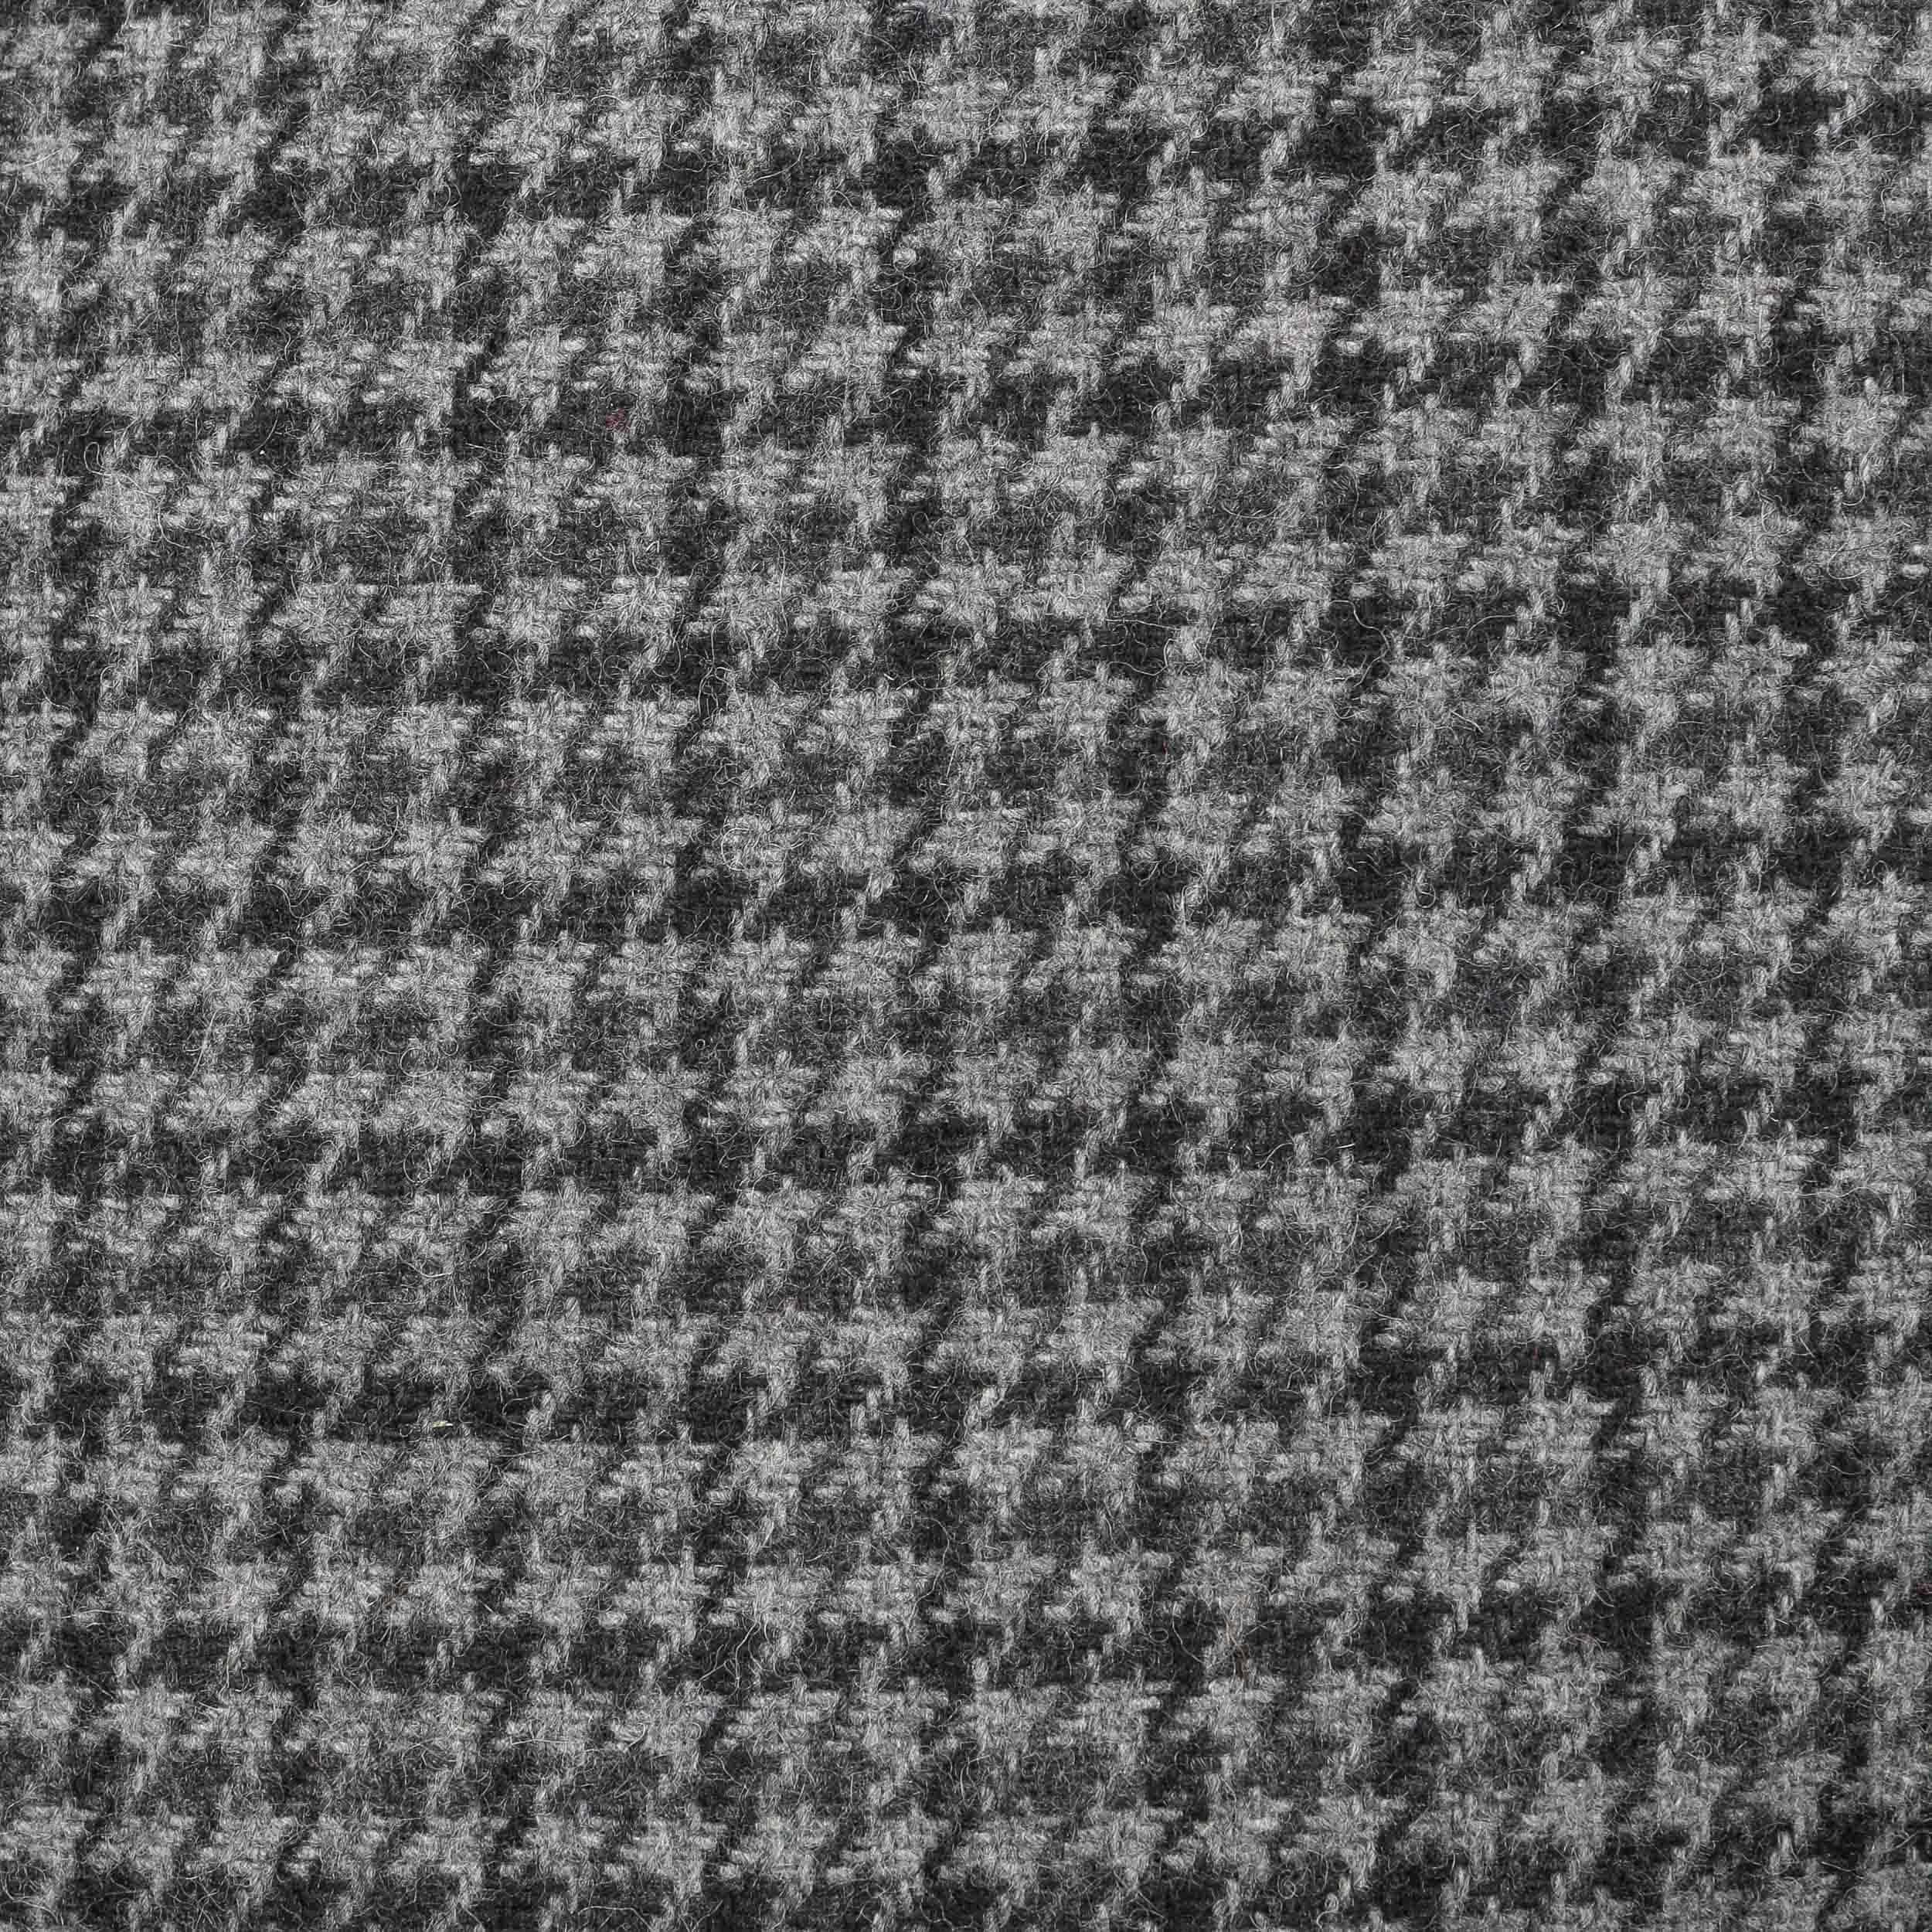 ... Coppola Inglese Classic Herringbone by Lipodo - grigio-nero 4 ... 138df39268c0